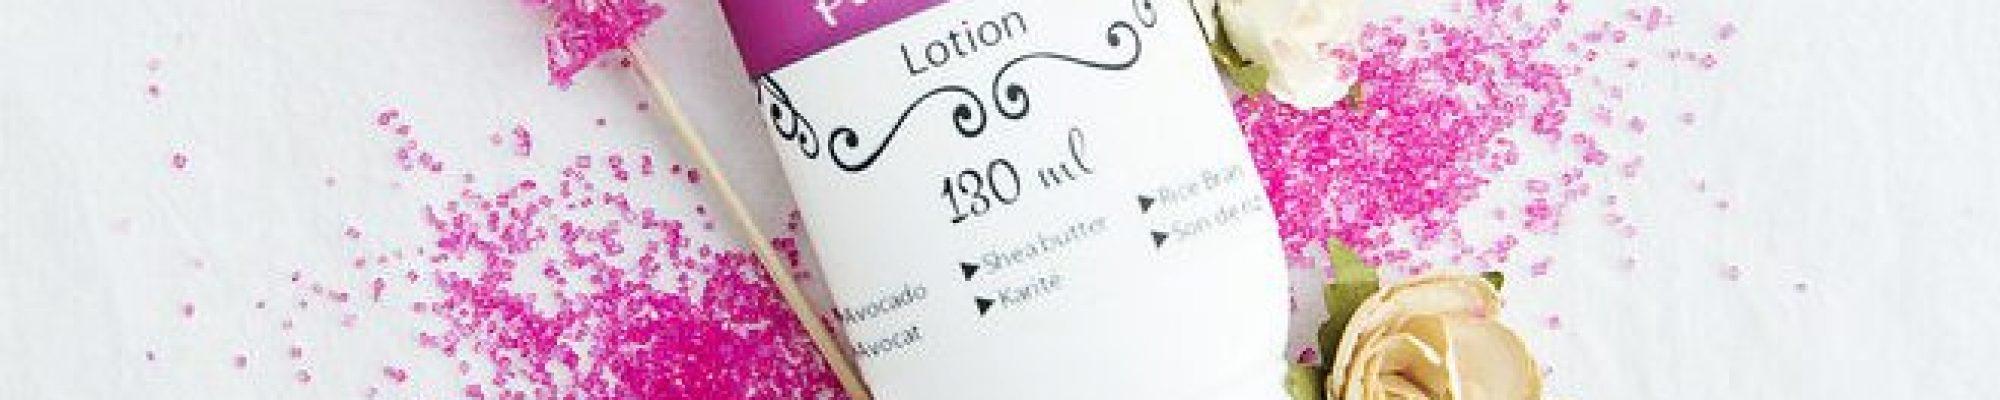 Sugar Lotion